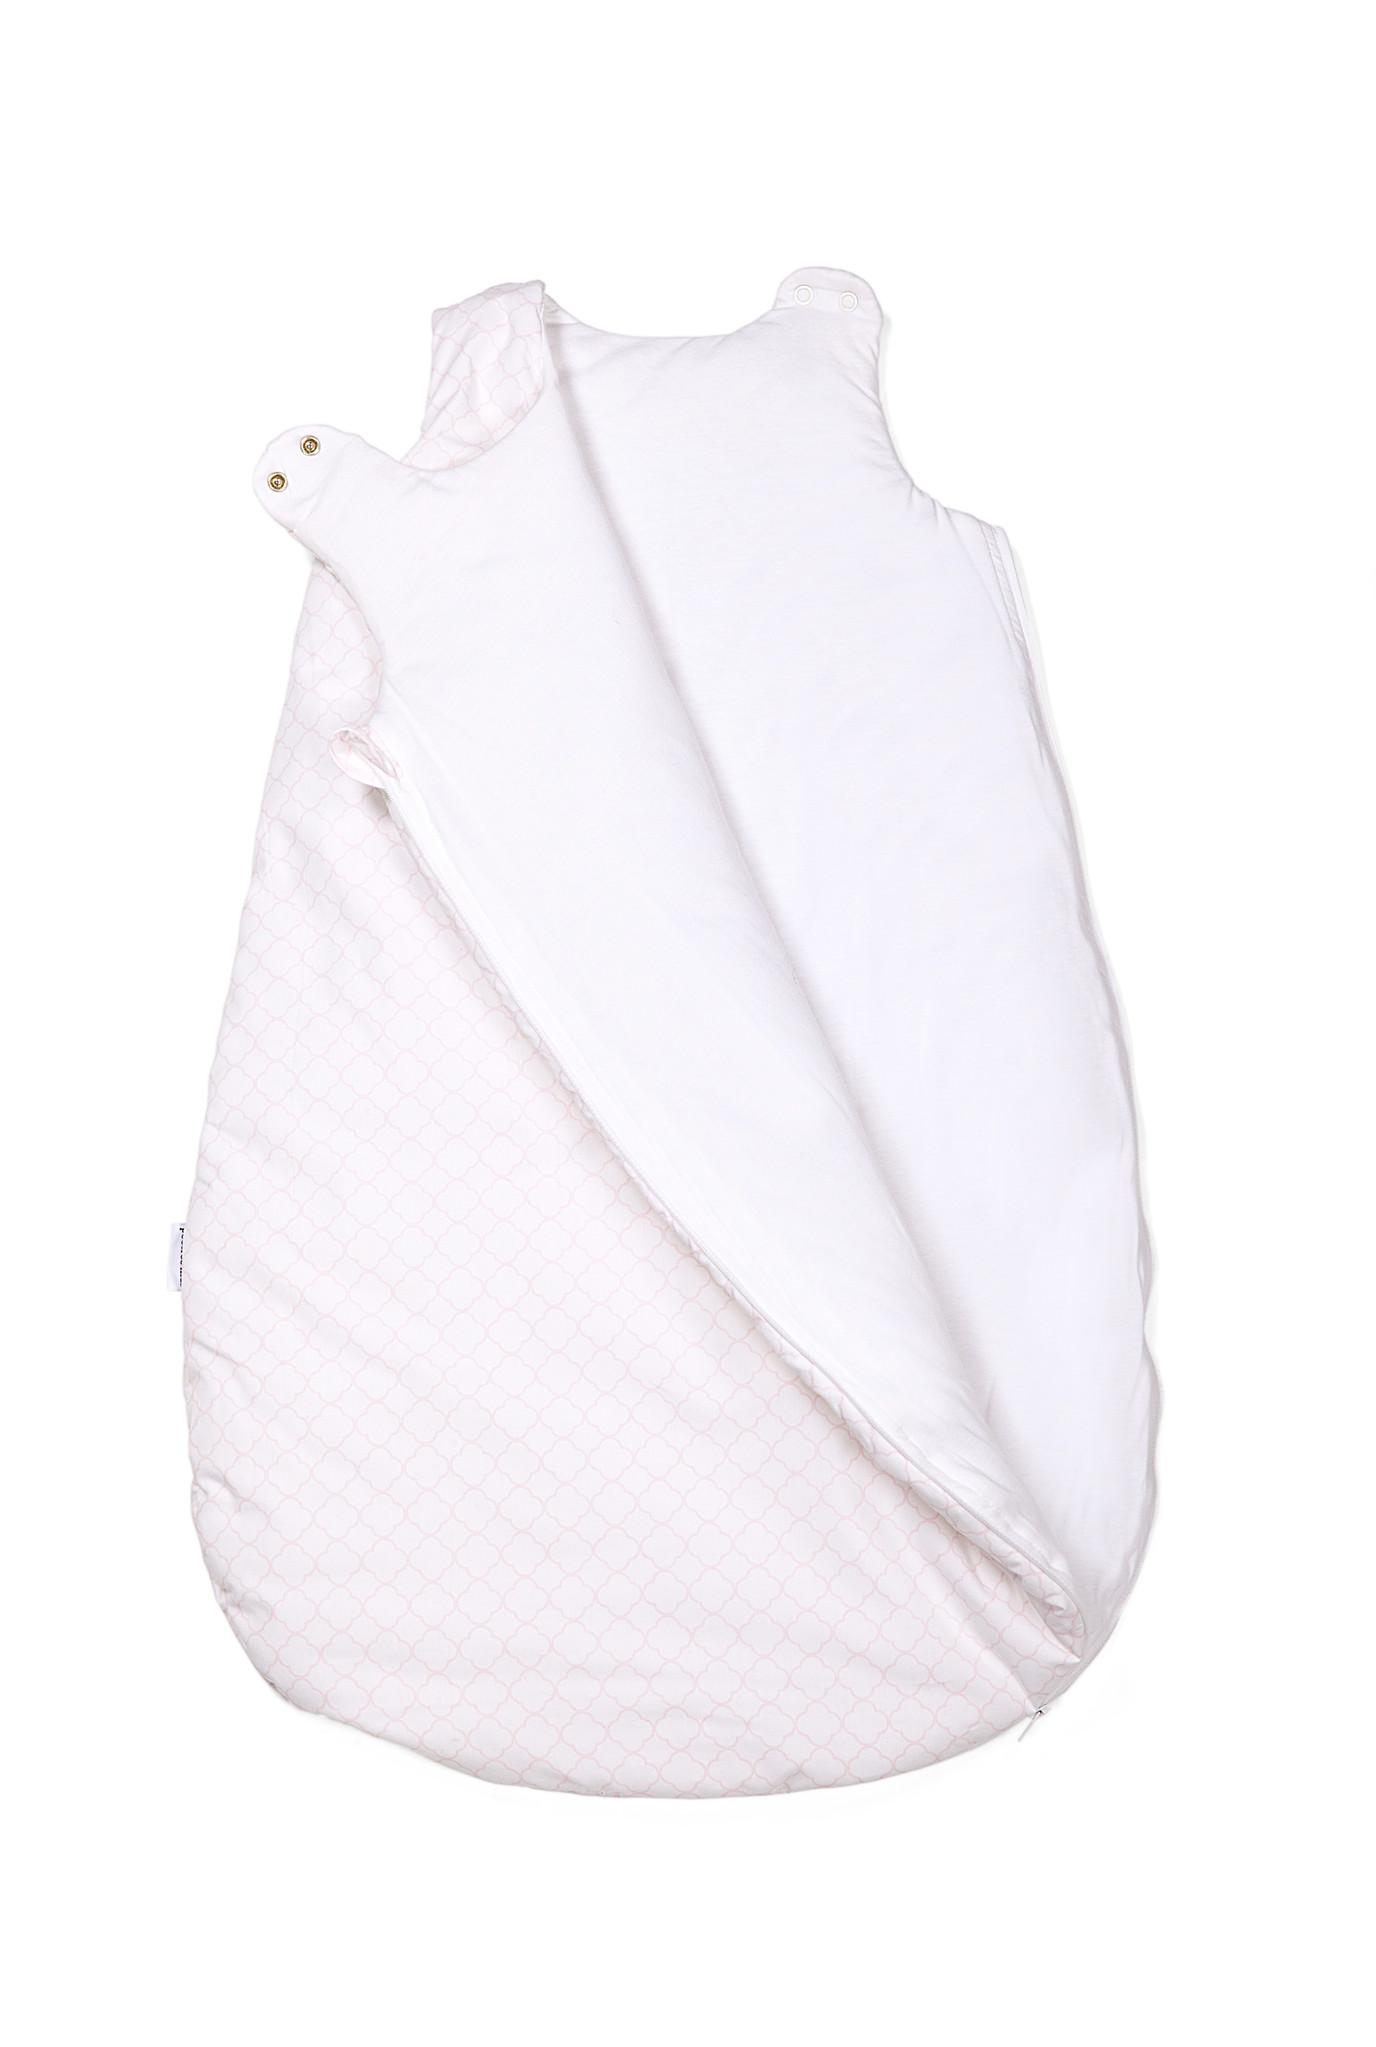 Sleepingbag 70cm Valencia-2